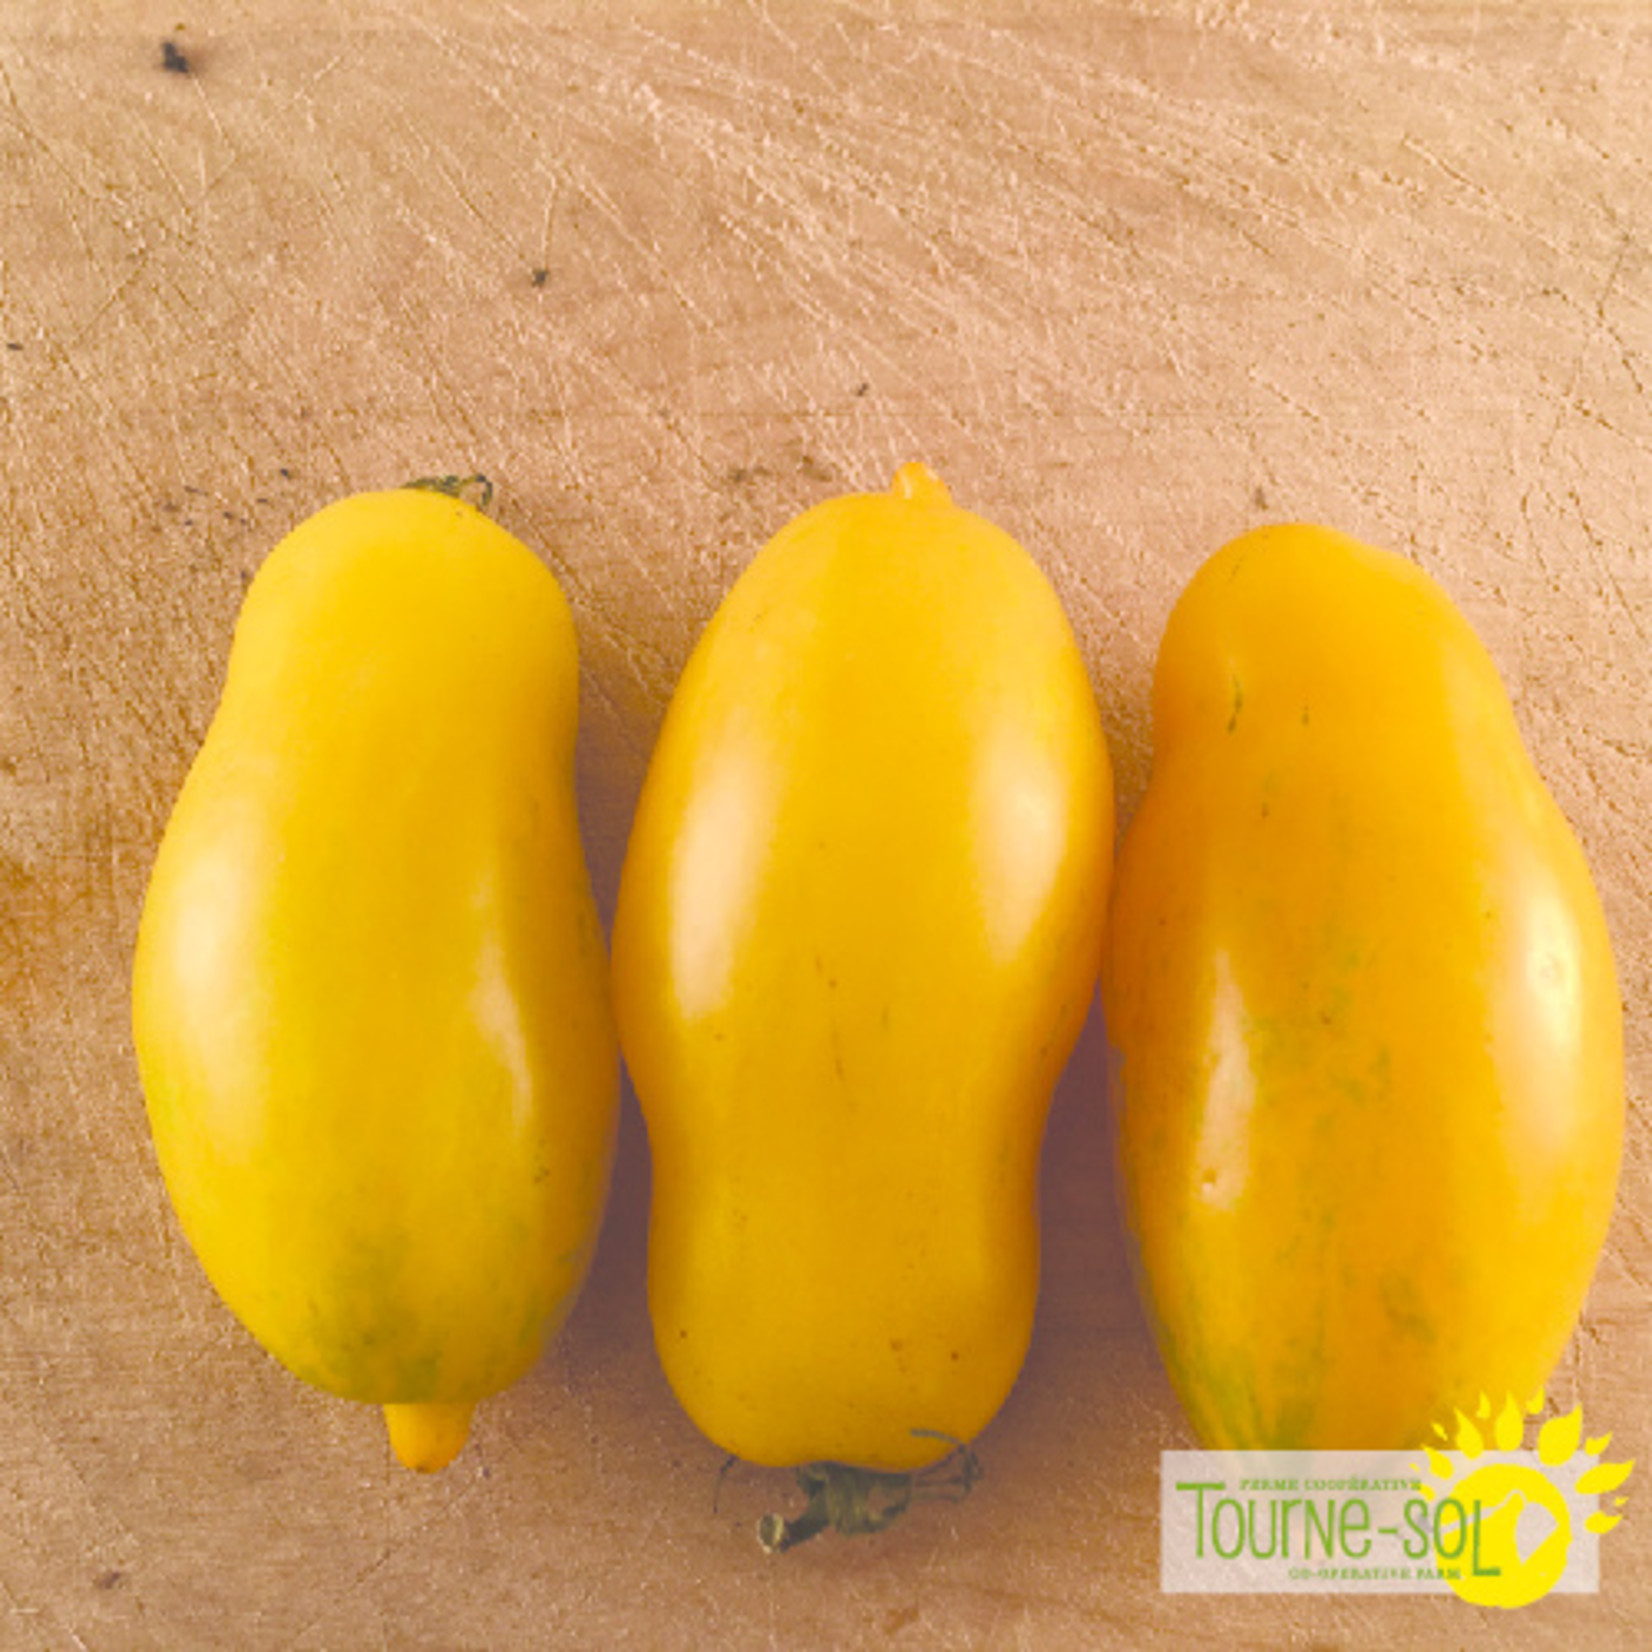 Tourne-Sol Tomate Jaune Sauce Banana Legs